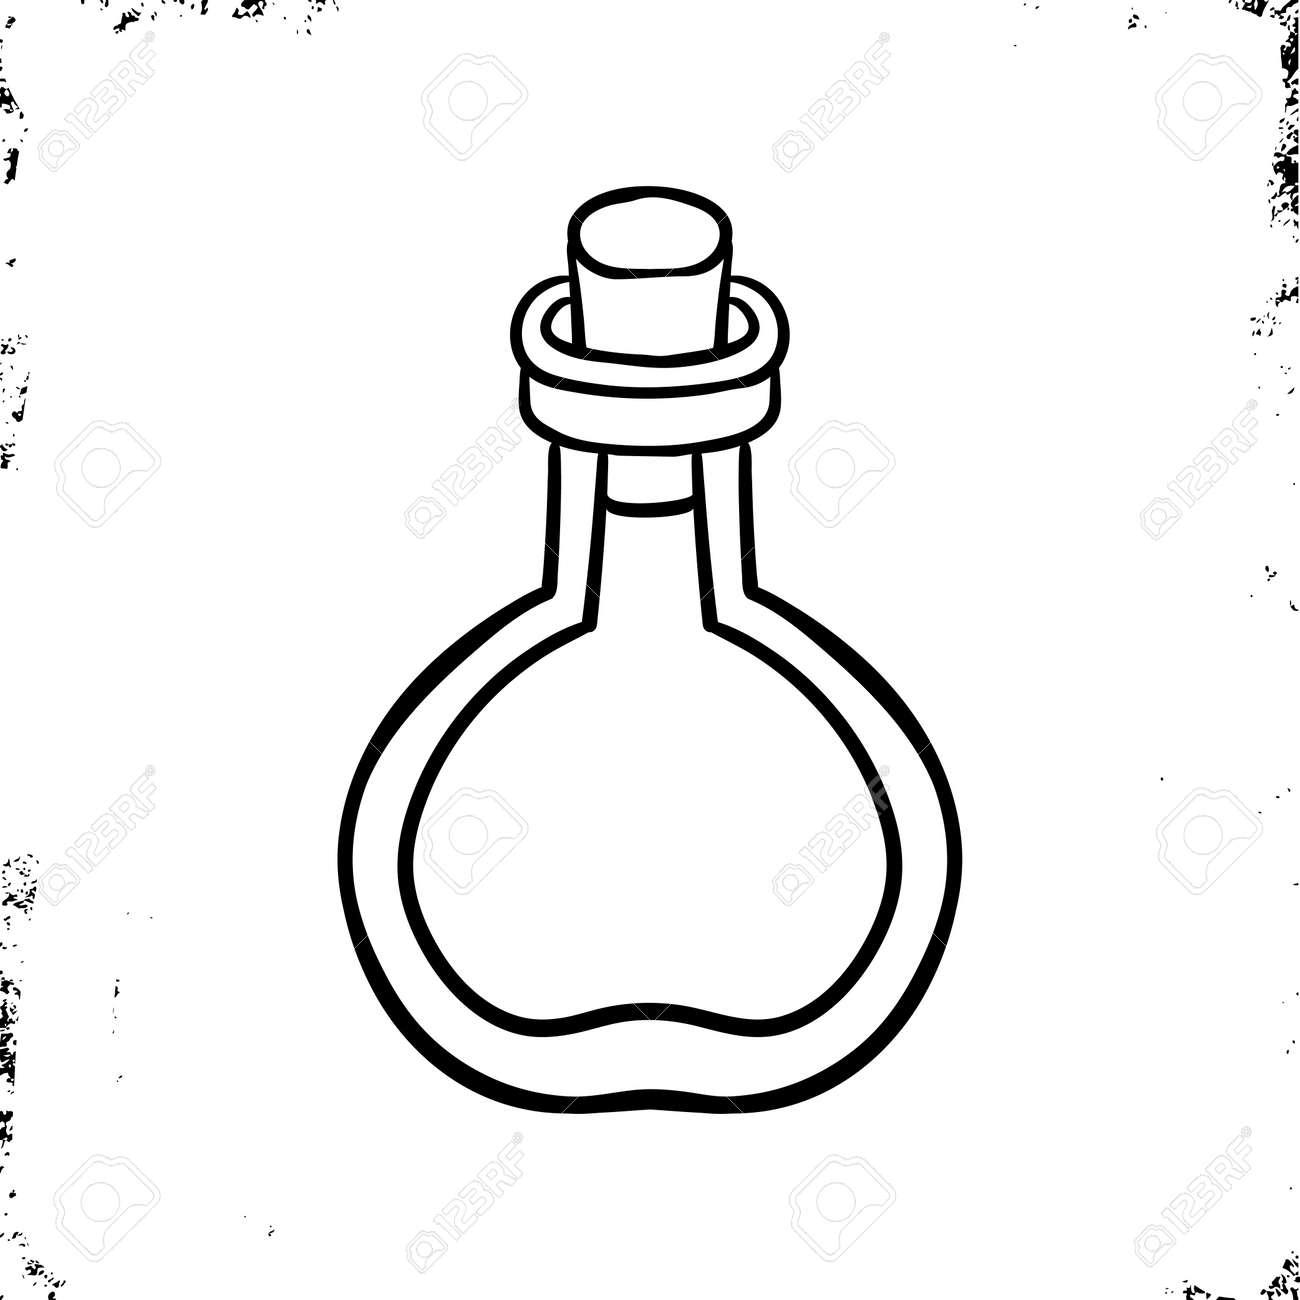 Lab bottle icon. Halloween icon. Laboratory icon. Magic bottle icon.Doodle line art. Witch's Magic Love Potion. Vector isolation - 132075168